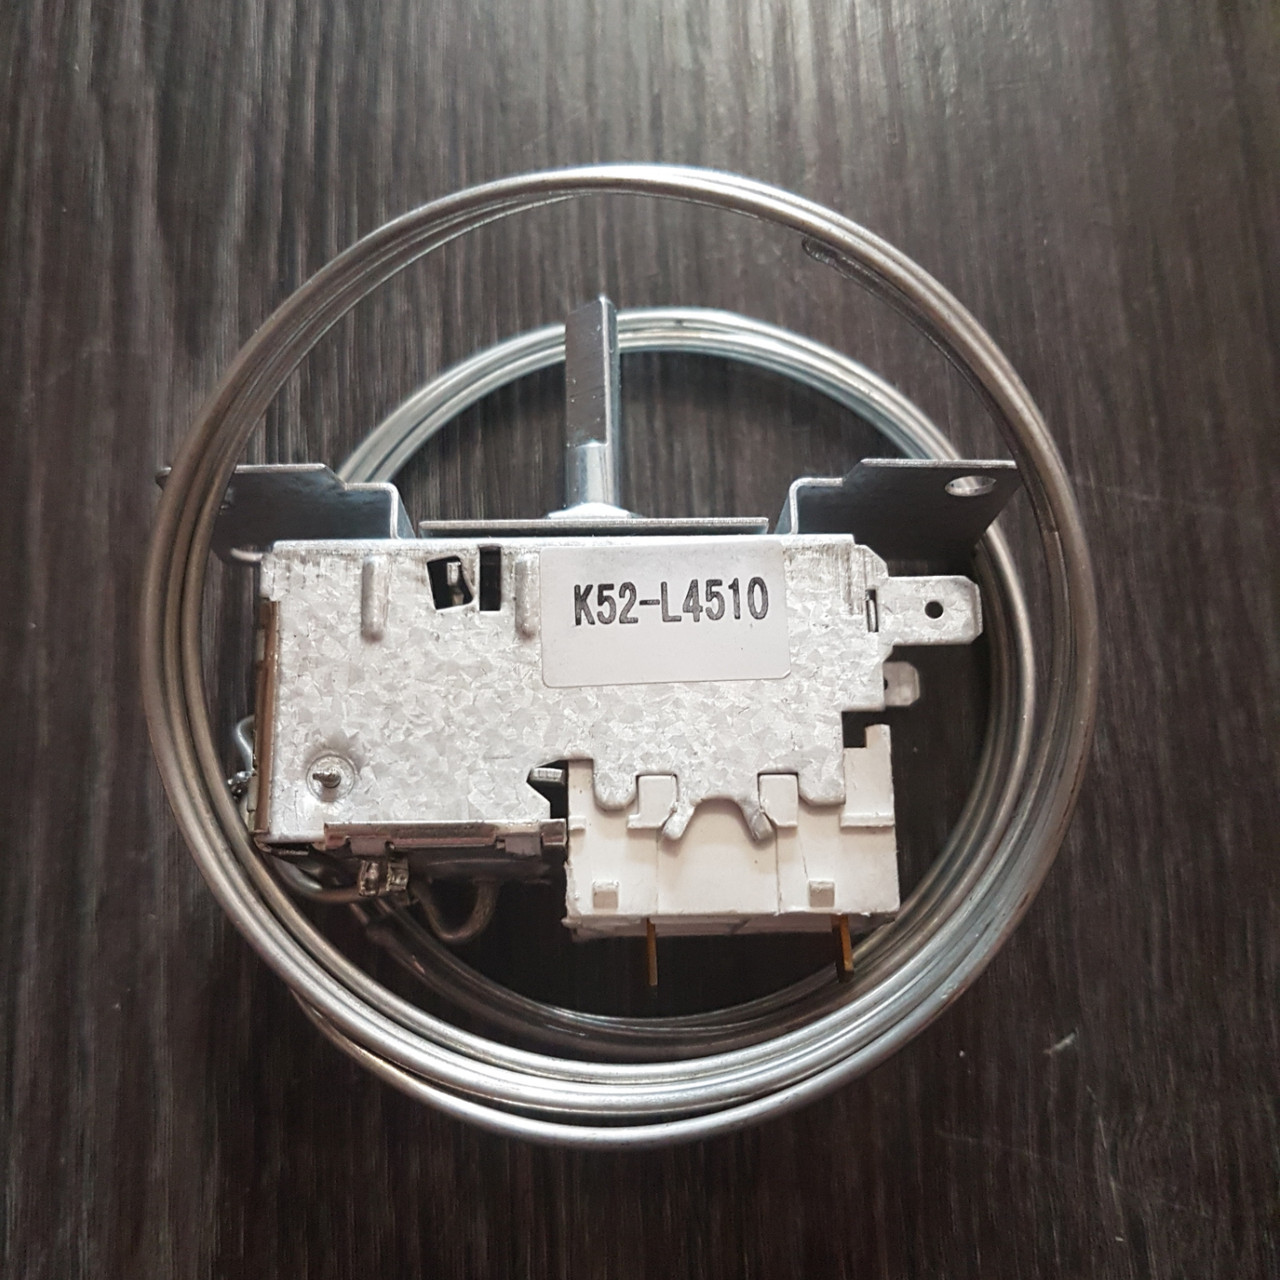 Датчик реле температуры Ranco-K-52 L4510(ENIEM)(2-x сильф)